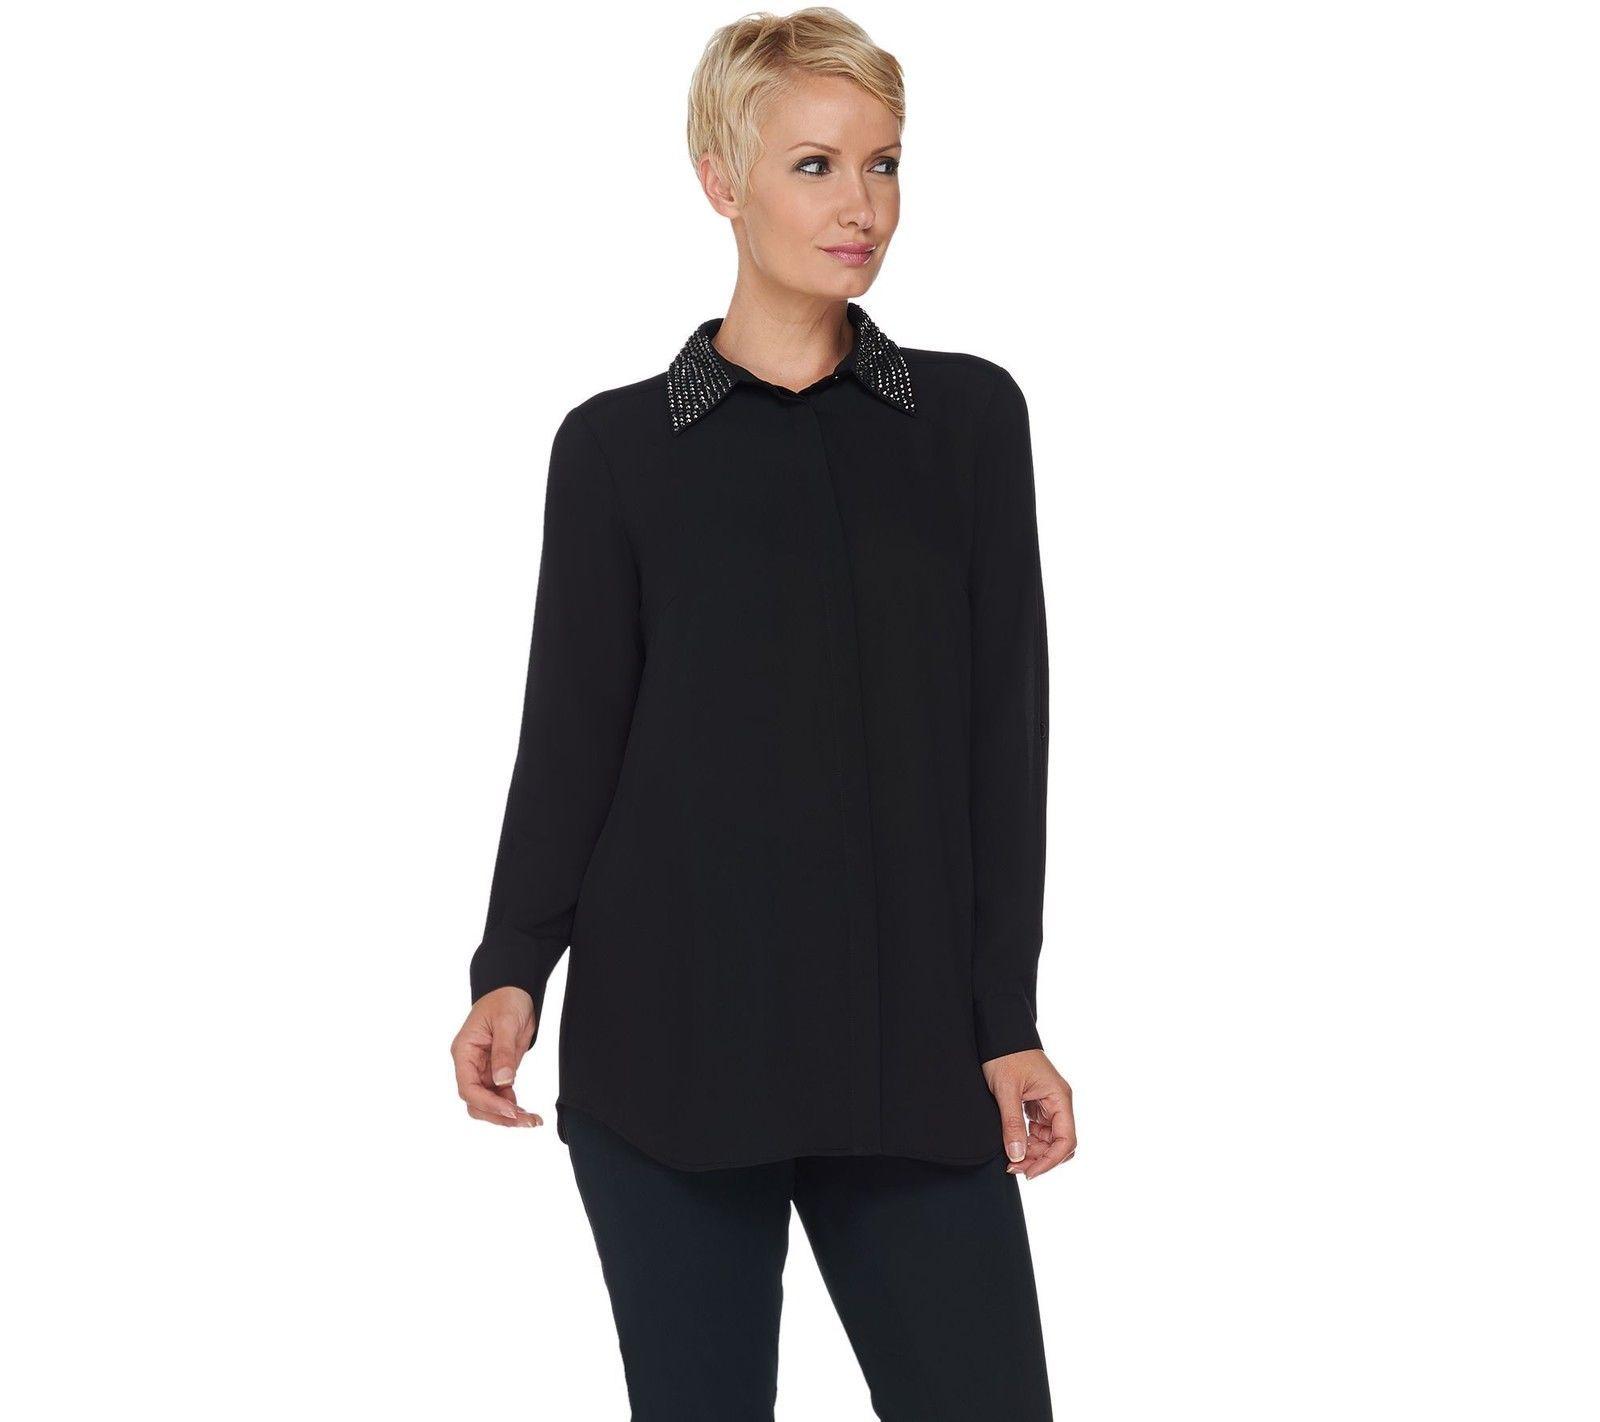 60.37$  Watch now - http://visuc.justgood.pw/vig/item.php?t=isz38az54395 - Joan Rivers Silky Blouse Embellished Collar Button Long Slv Black L NEW A284162